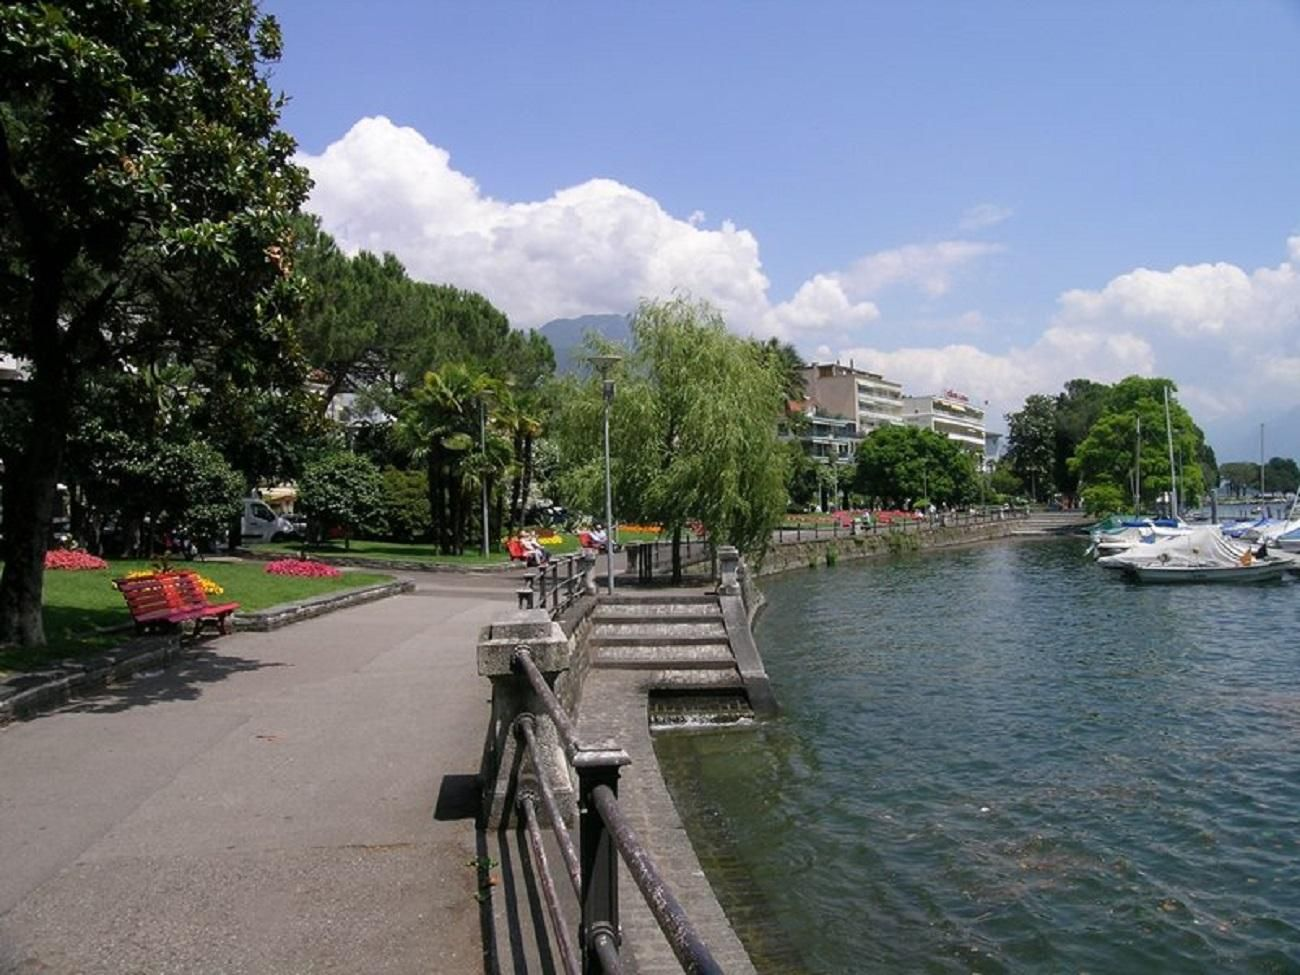 Appartement de vacances Malibu (881313), Minusio, Lac Majeur (CH), Tessin, Suisse, image 10